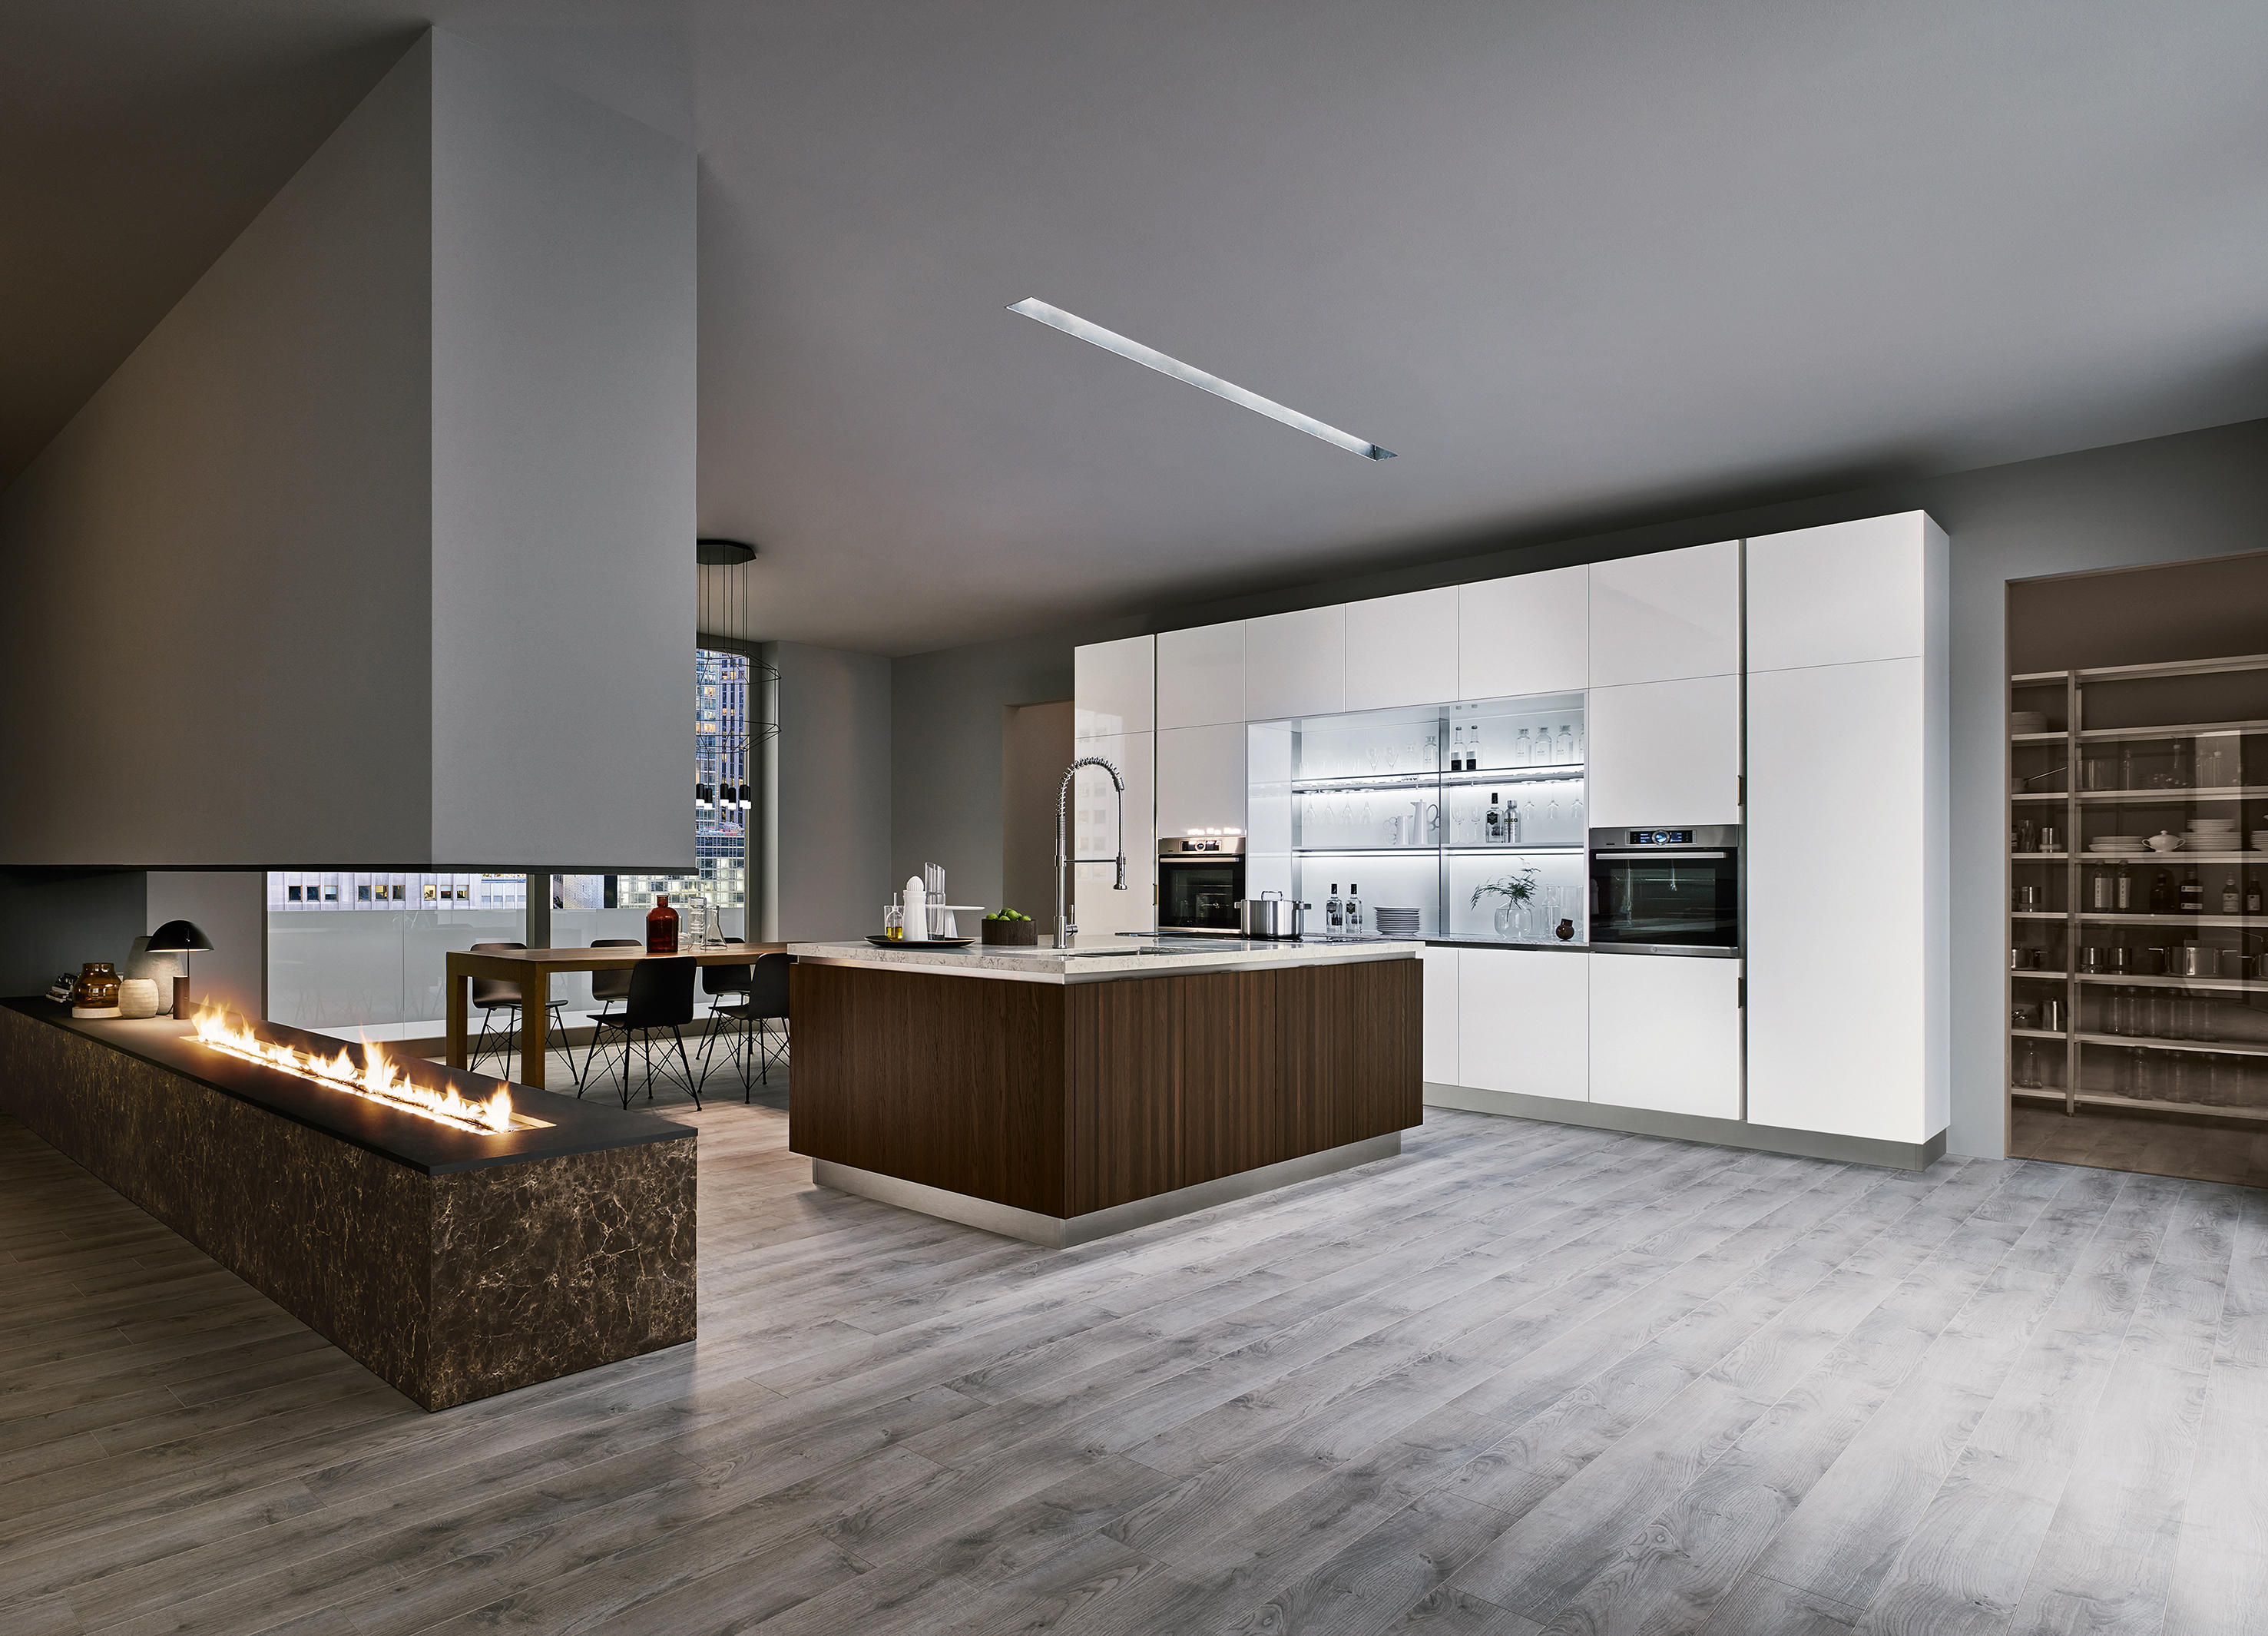 Veneta Cucine Extra Up.Extra Go Fitted Kitchens From Veneta Cucine Architonic